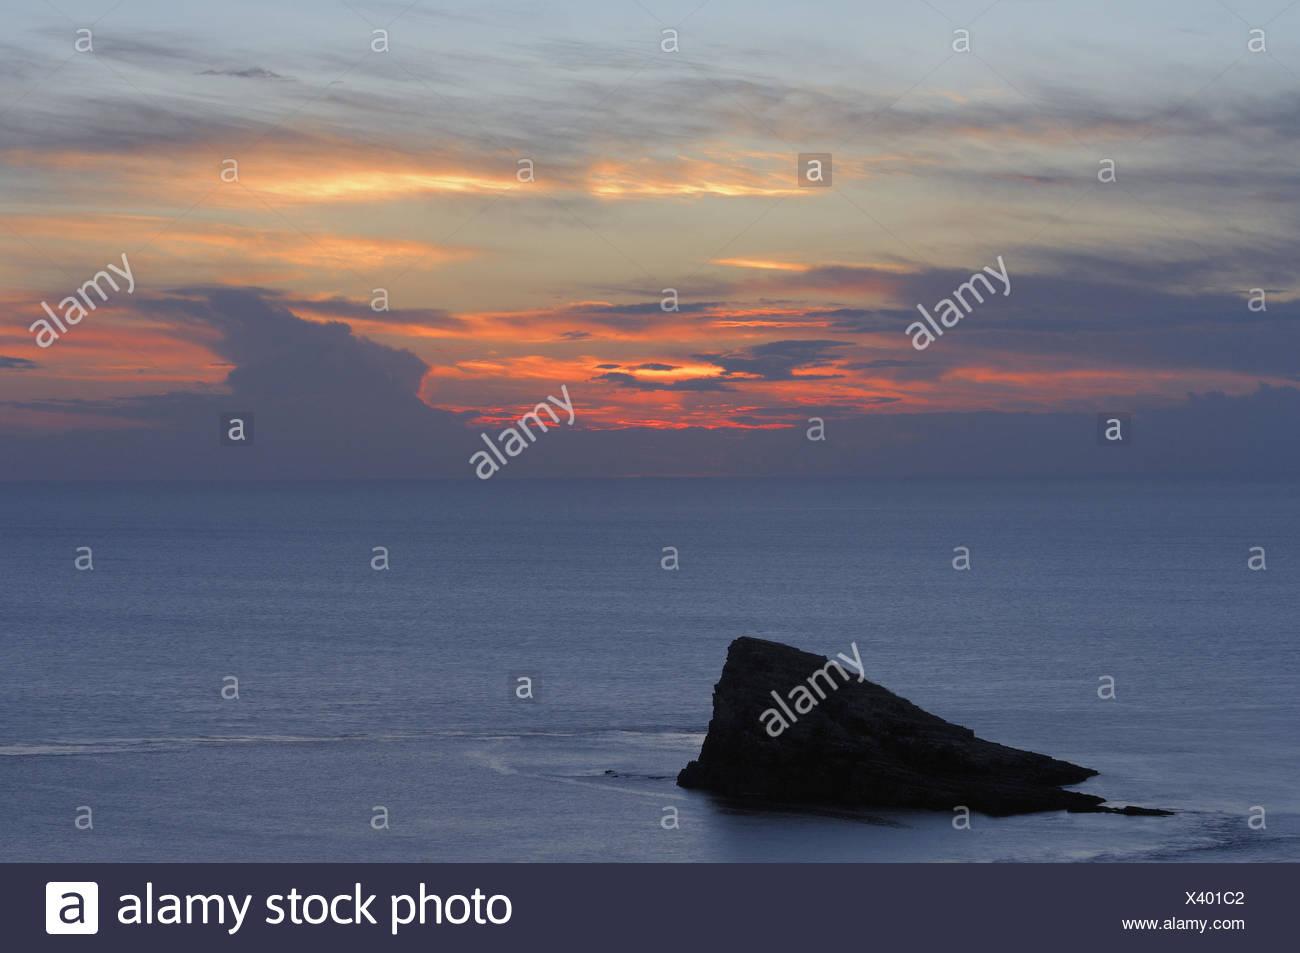 Sea, coast, bile coast, bile, afterglow, France, Brittany - Stock Image